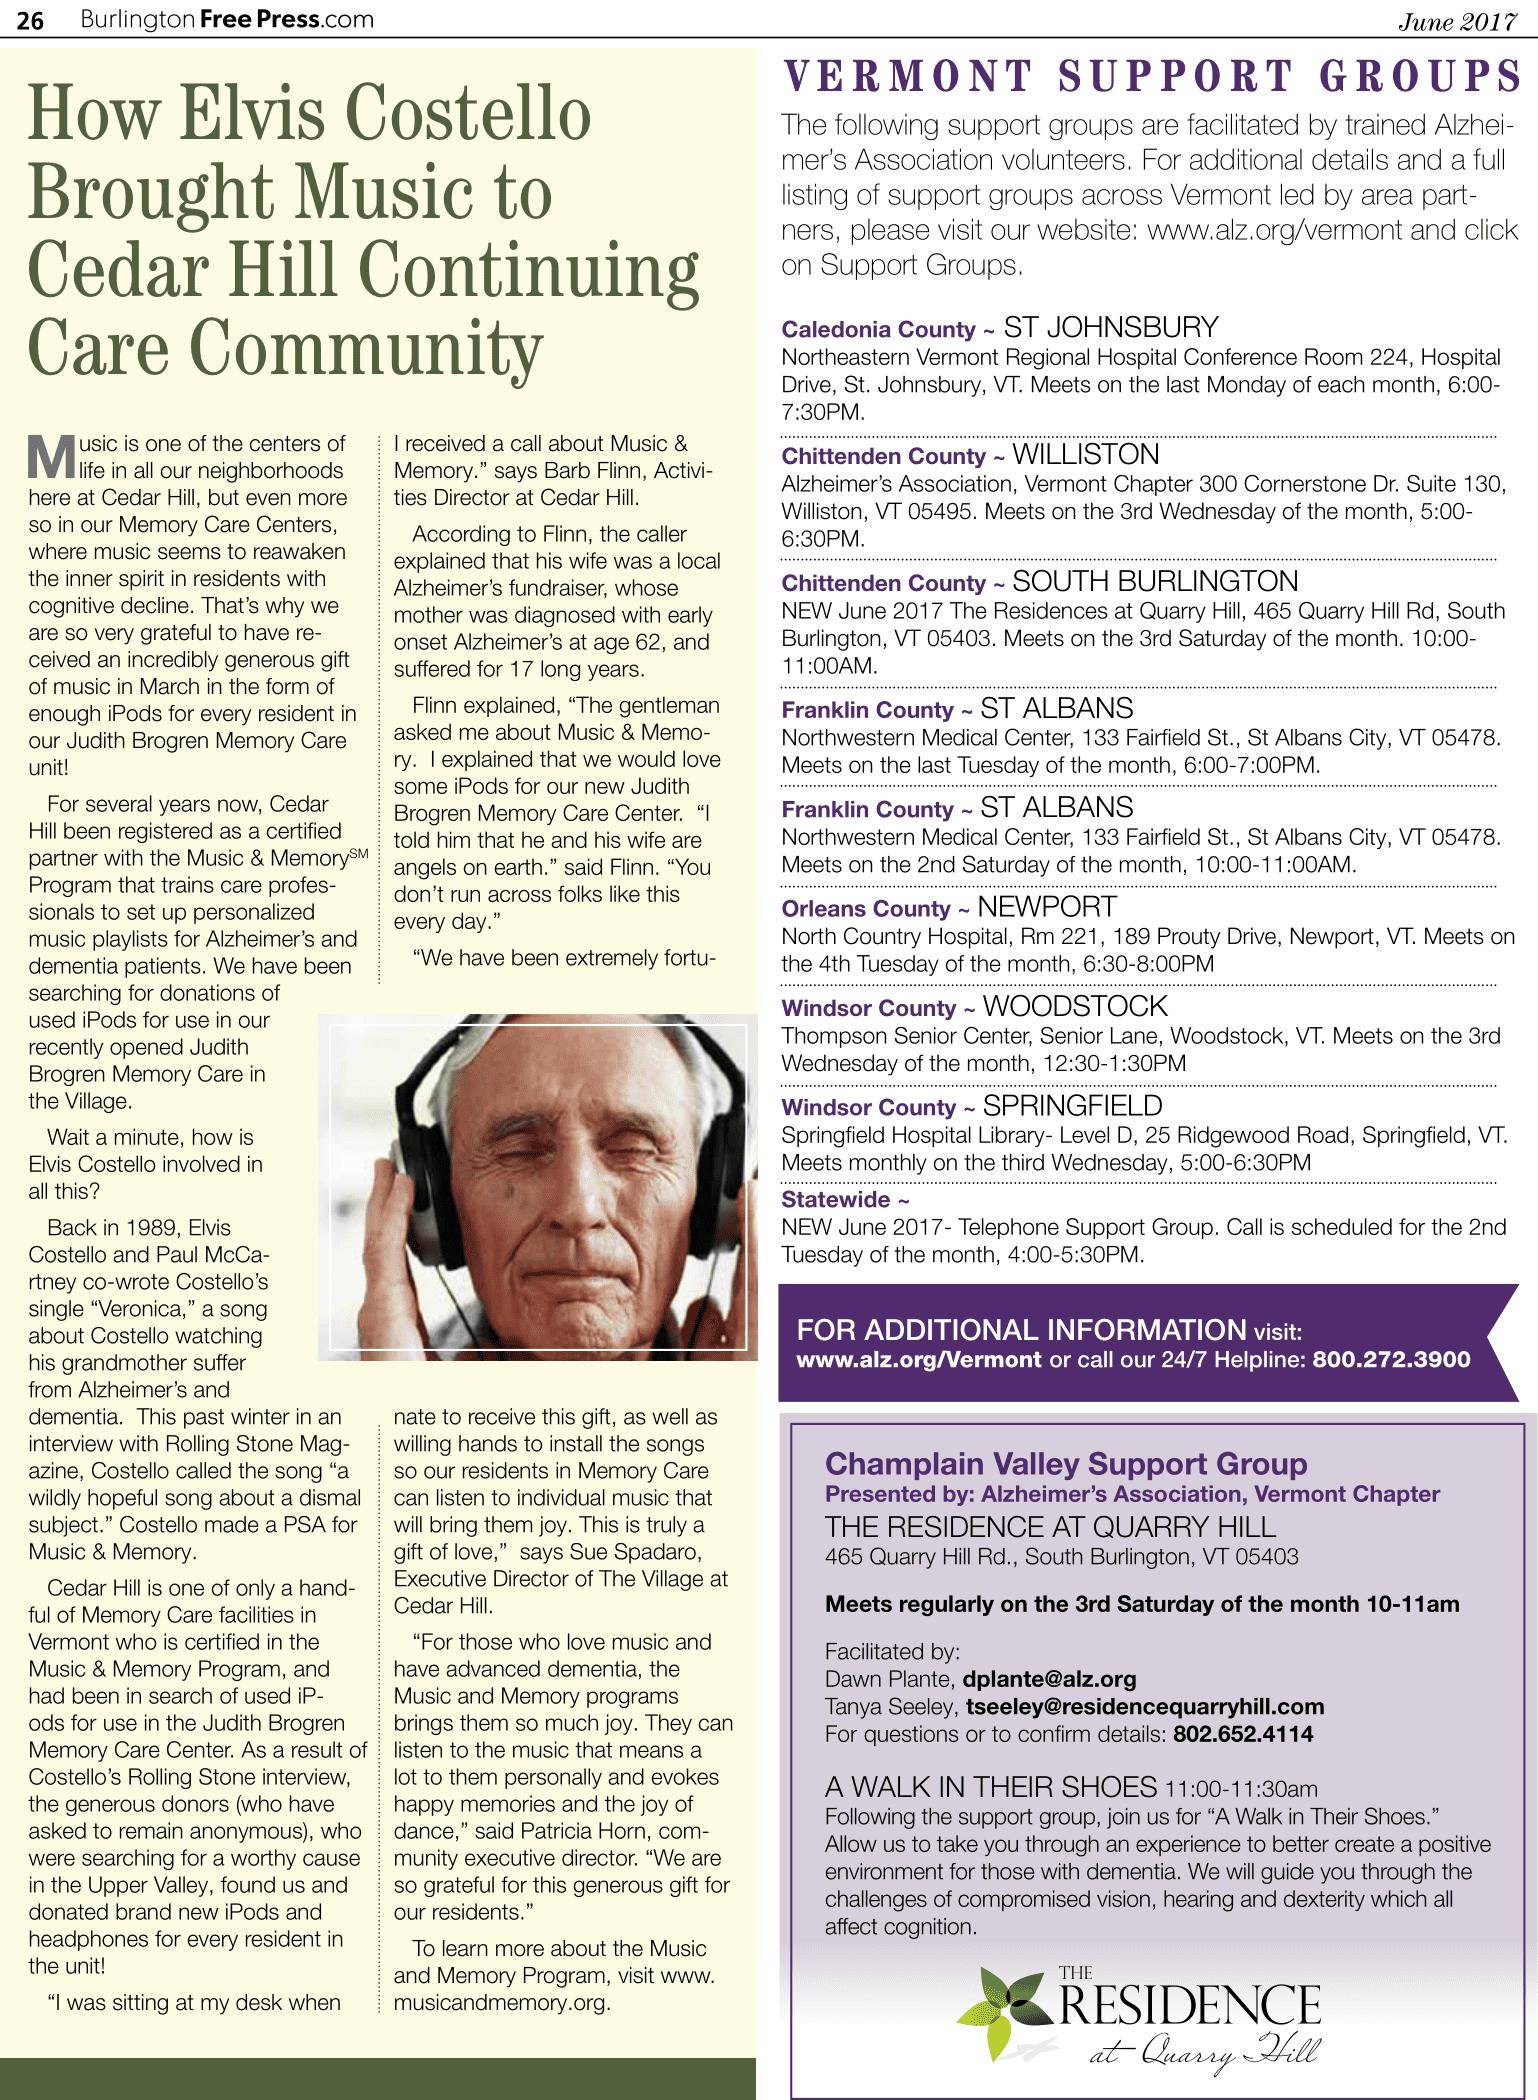 Memory Care Article - Burlington Free Press 2017